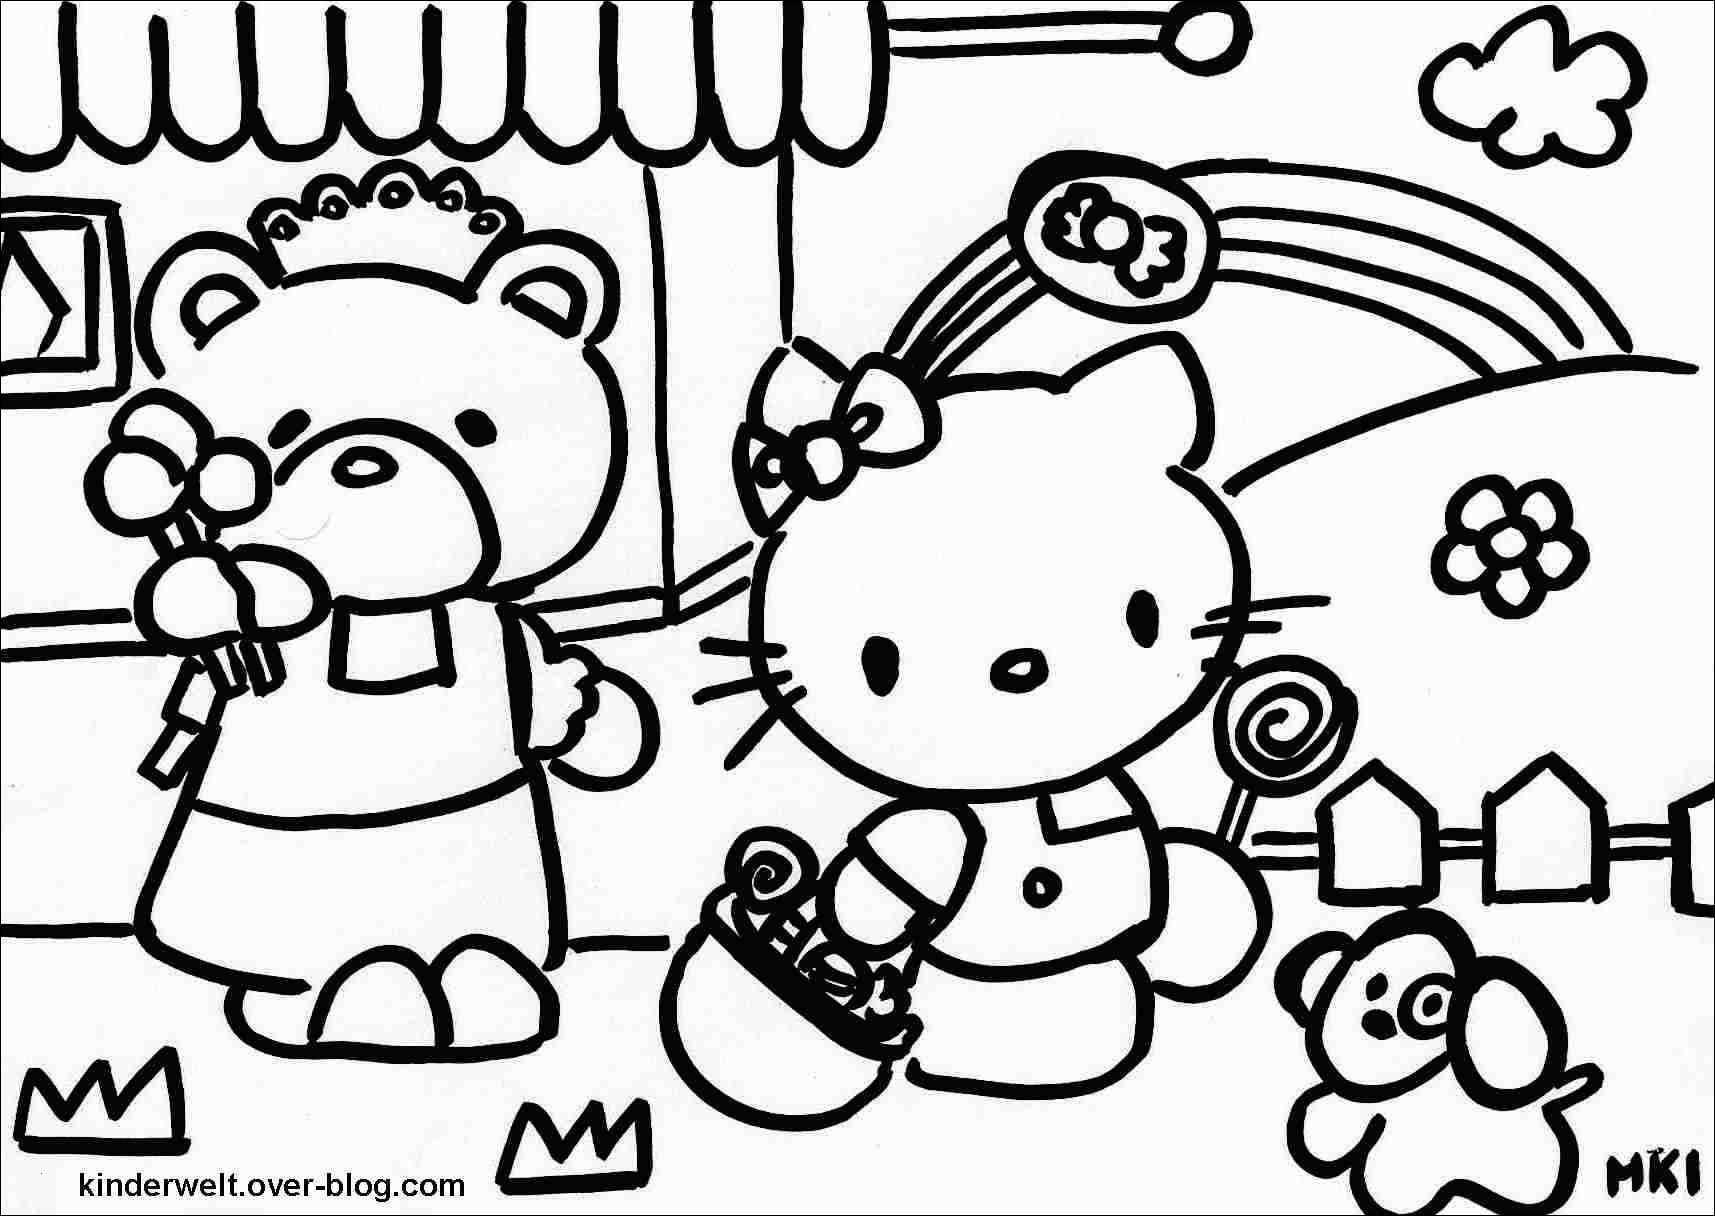 Kreativ Hello Kitty Ausmalbilder Online Kostenlos Fr Dein innen Hello Kitty Kostenlos